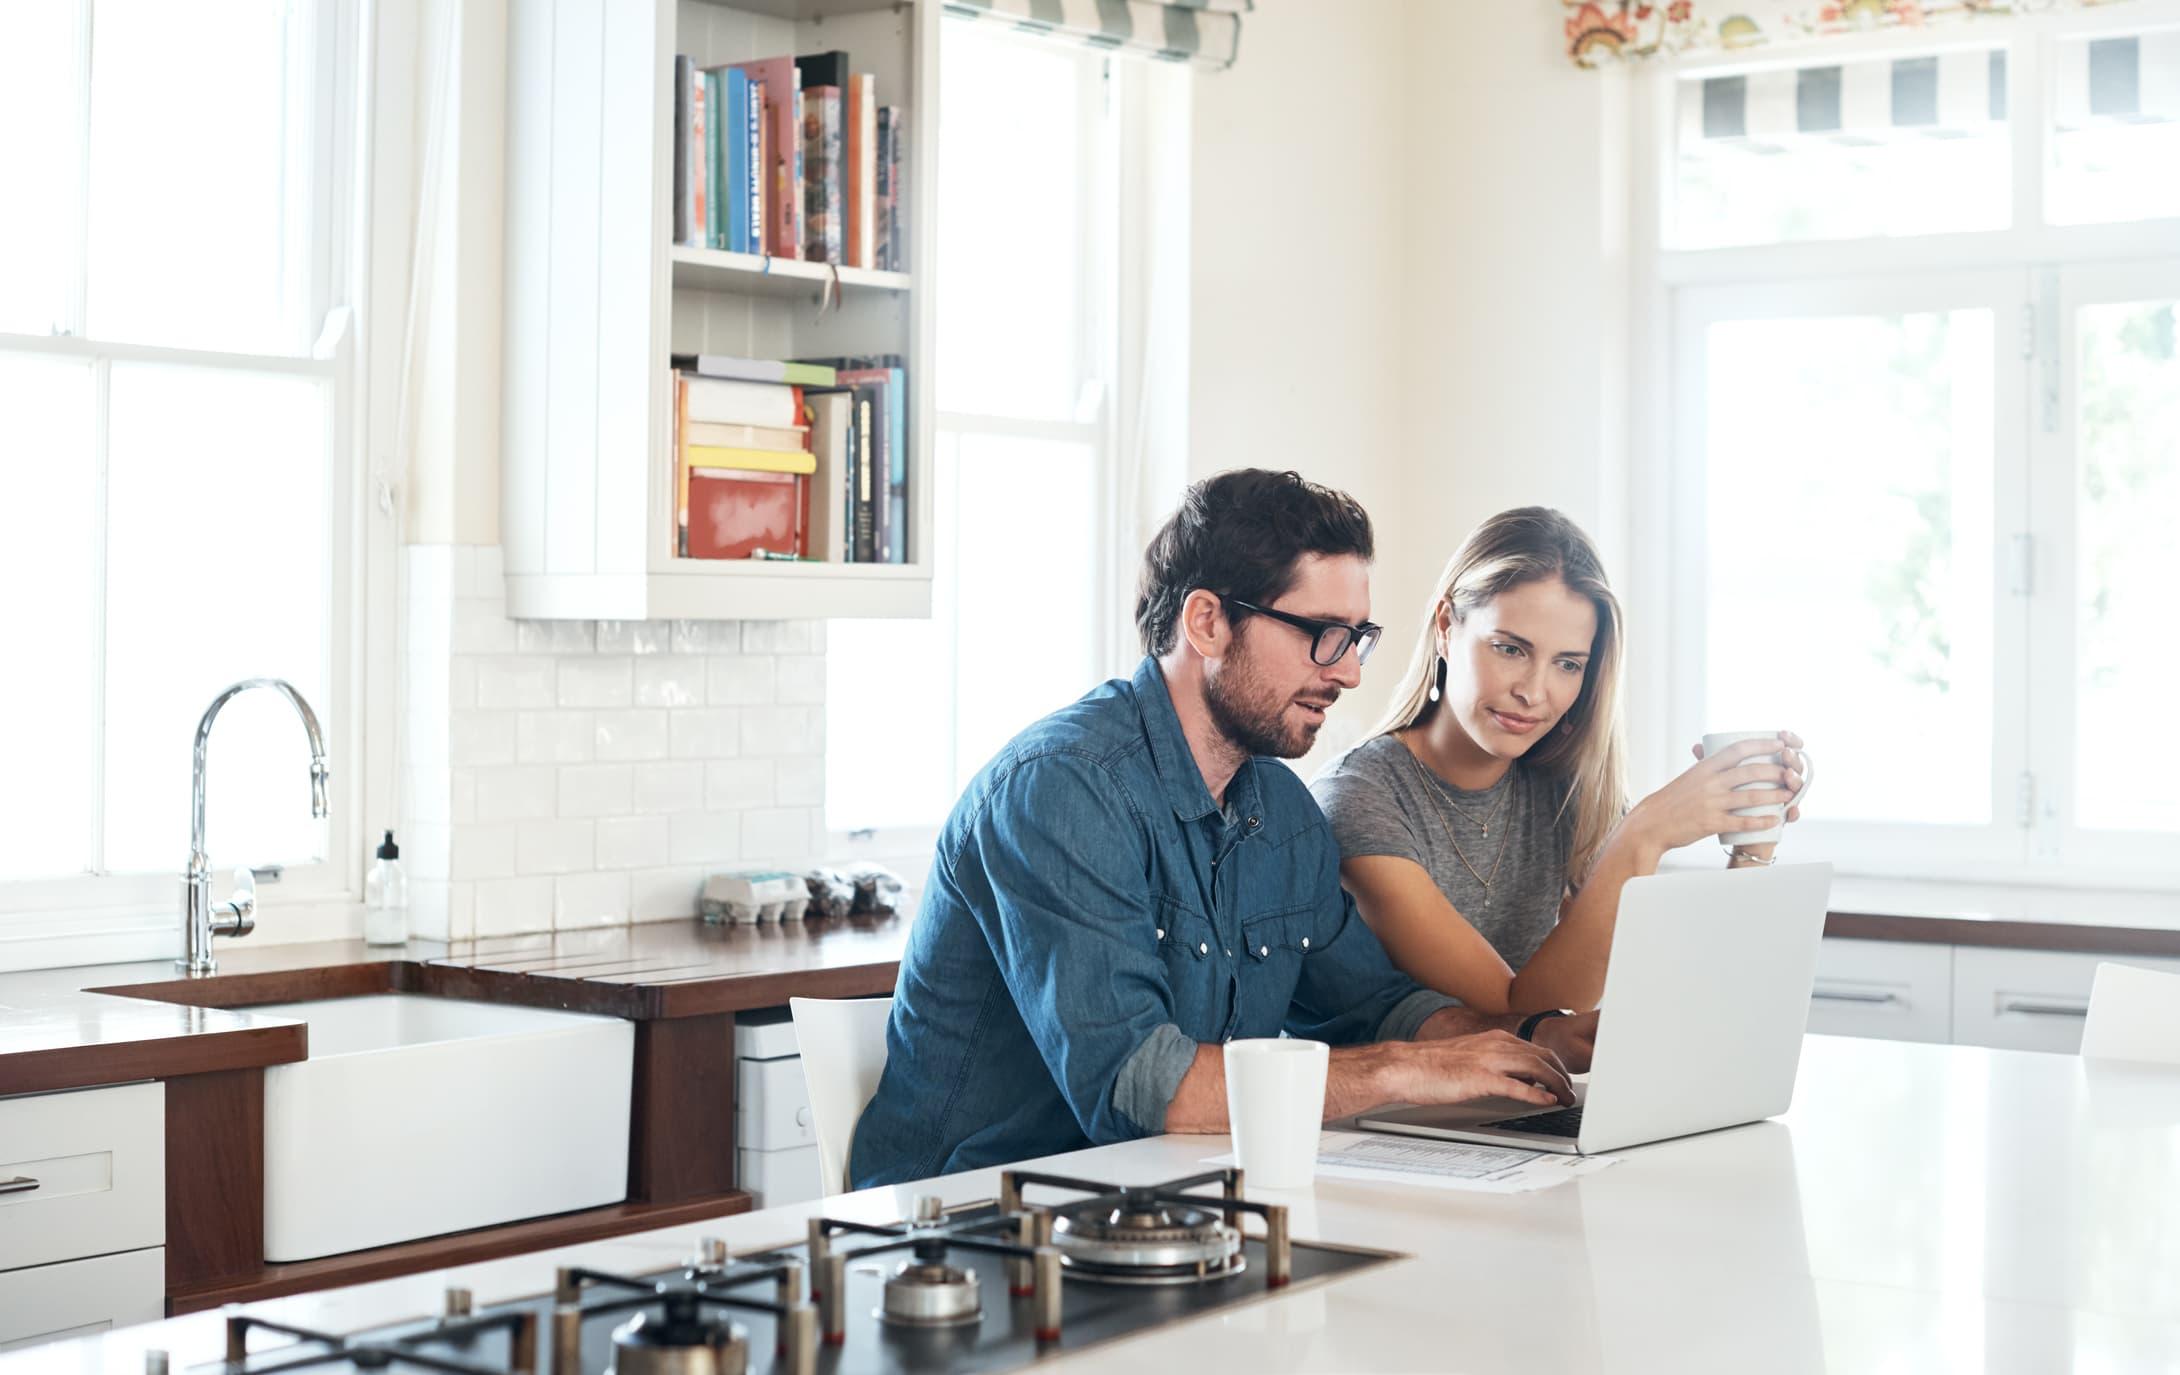 Couple on laptop together ExpressVPN vs IPVanish